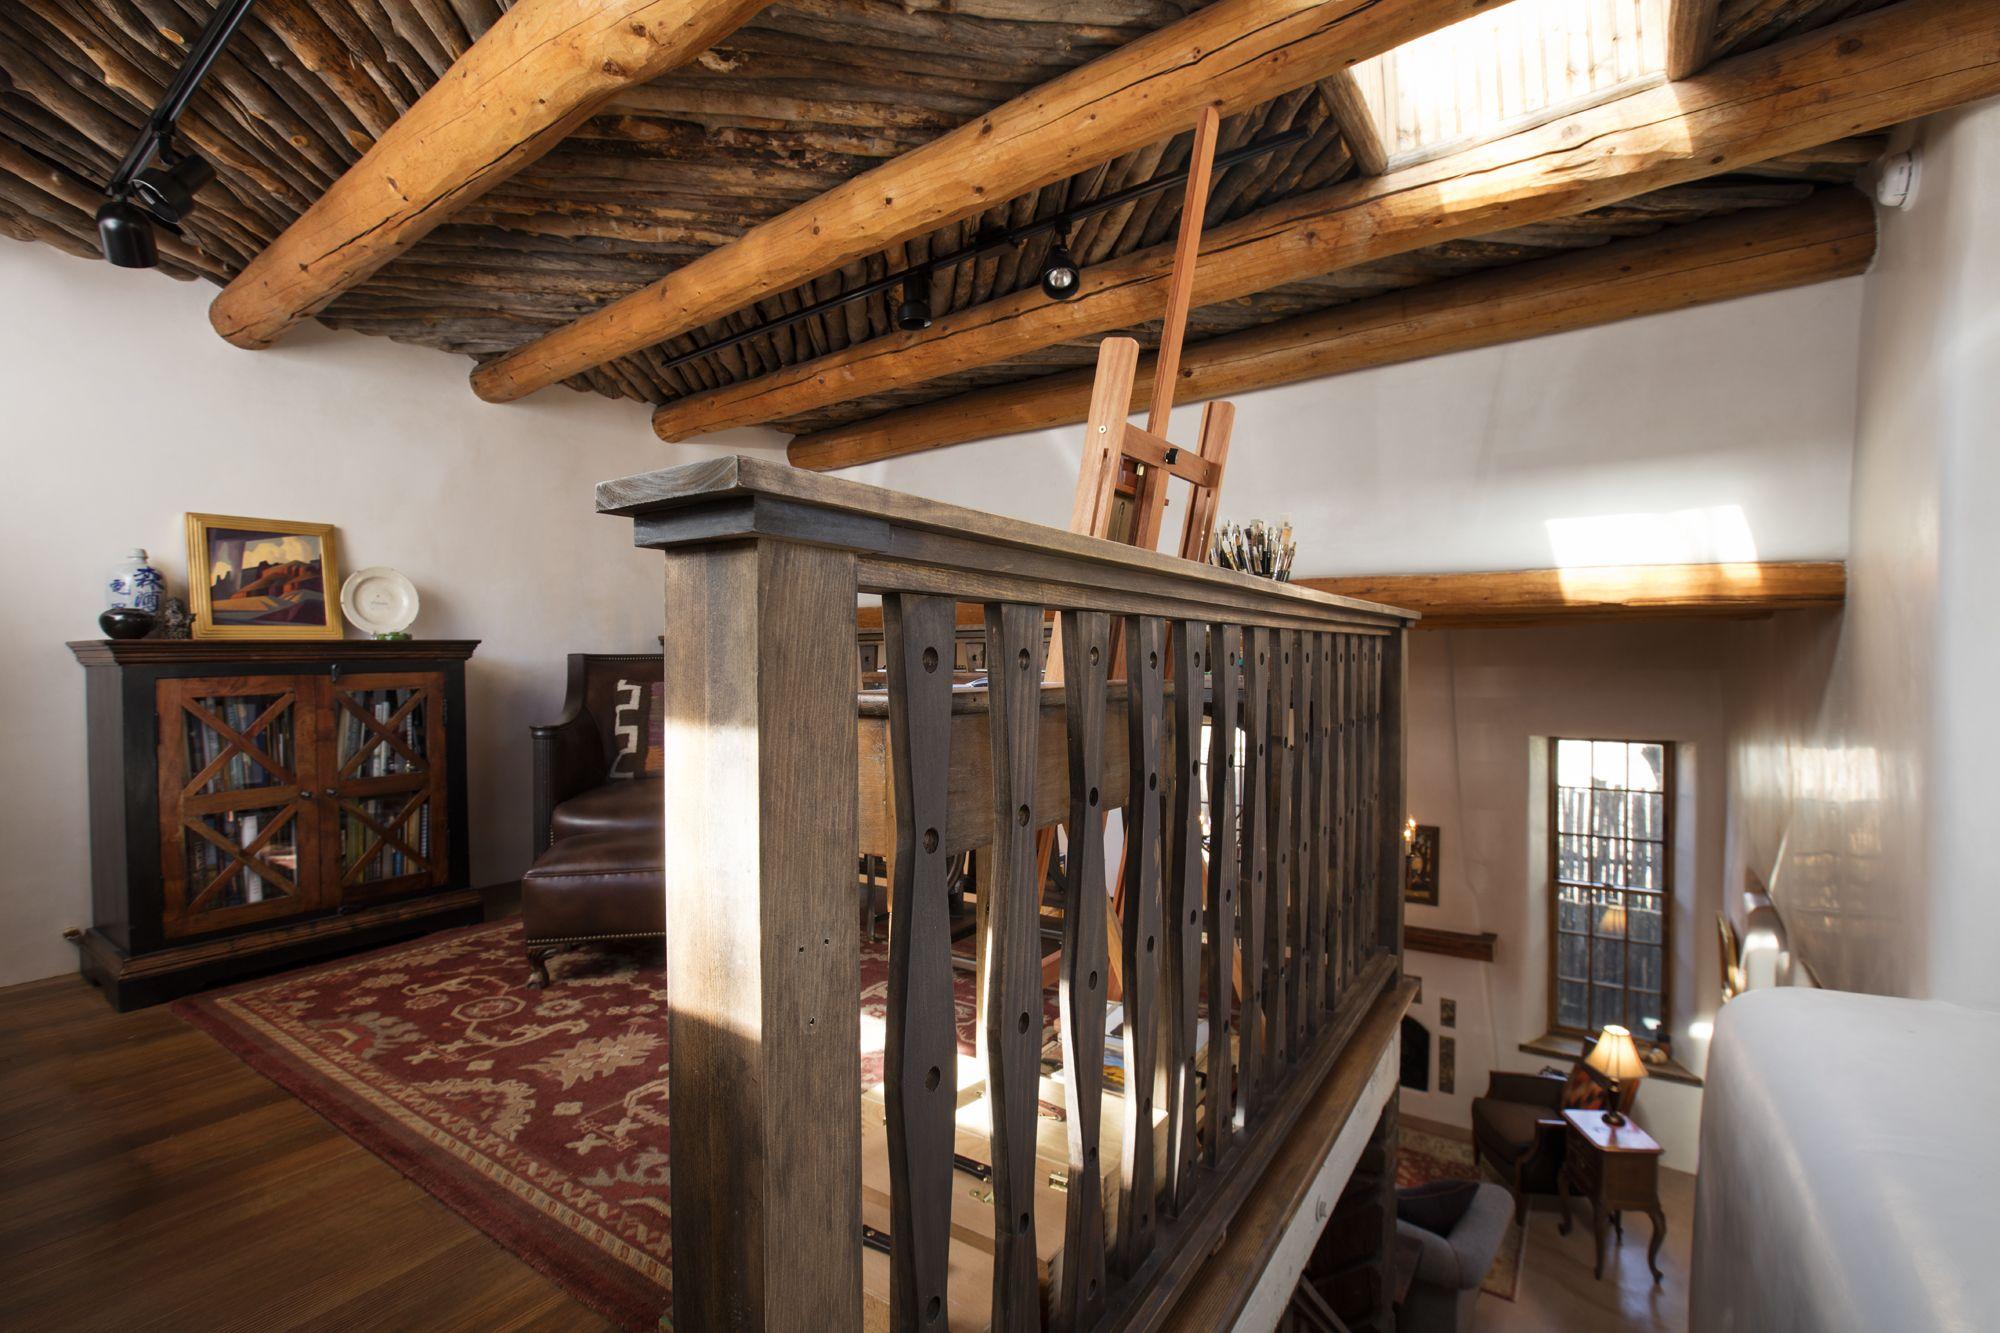 Incroyable Southwest Interiors